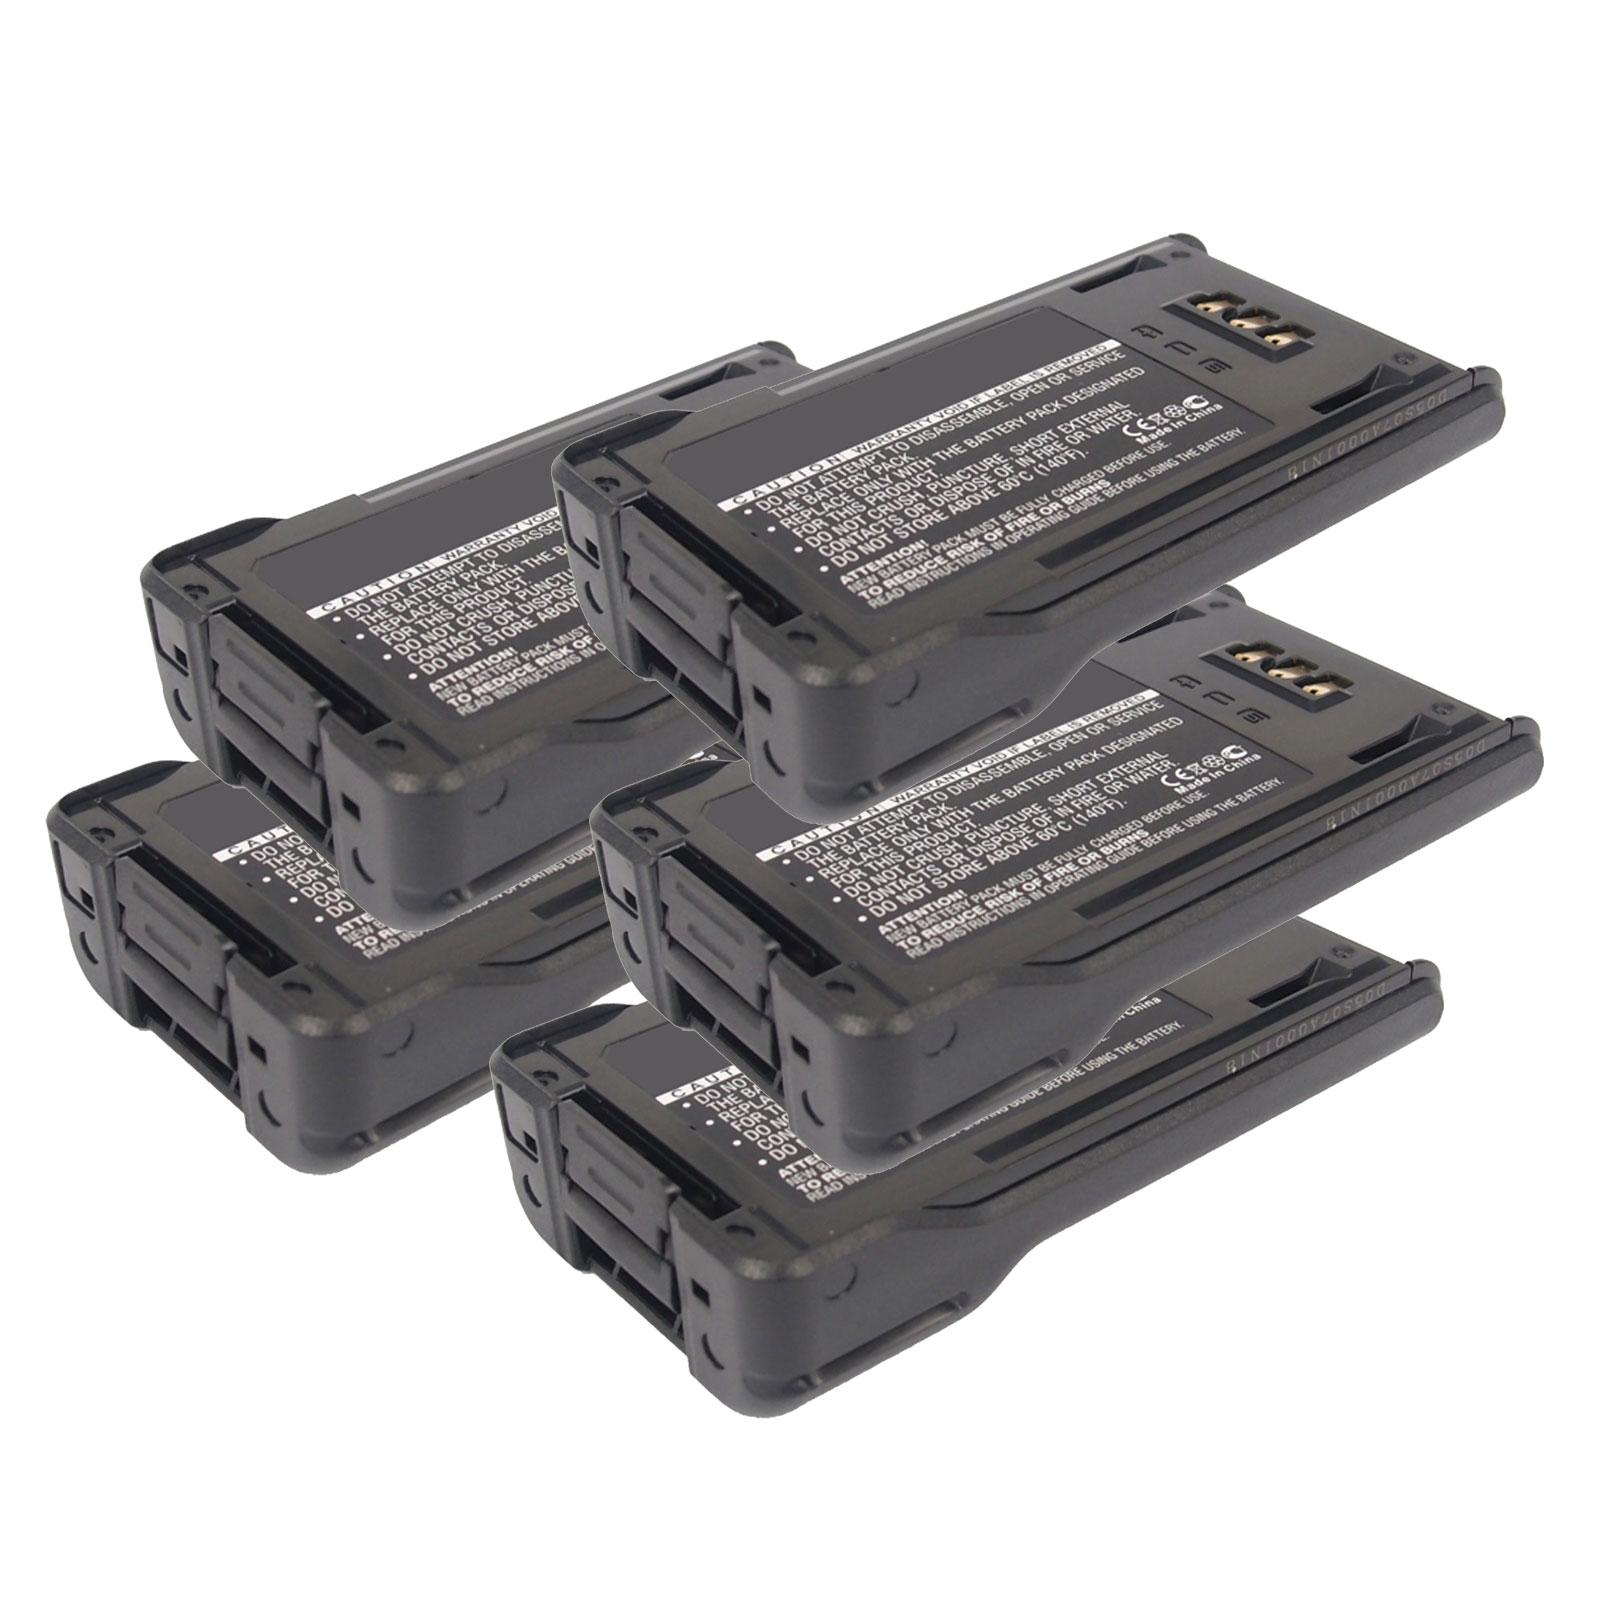 5X 7.4V 2500mAh Li-Ion FRS 2way Radio Battery Fits Kenwoo...